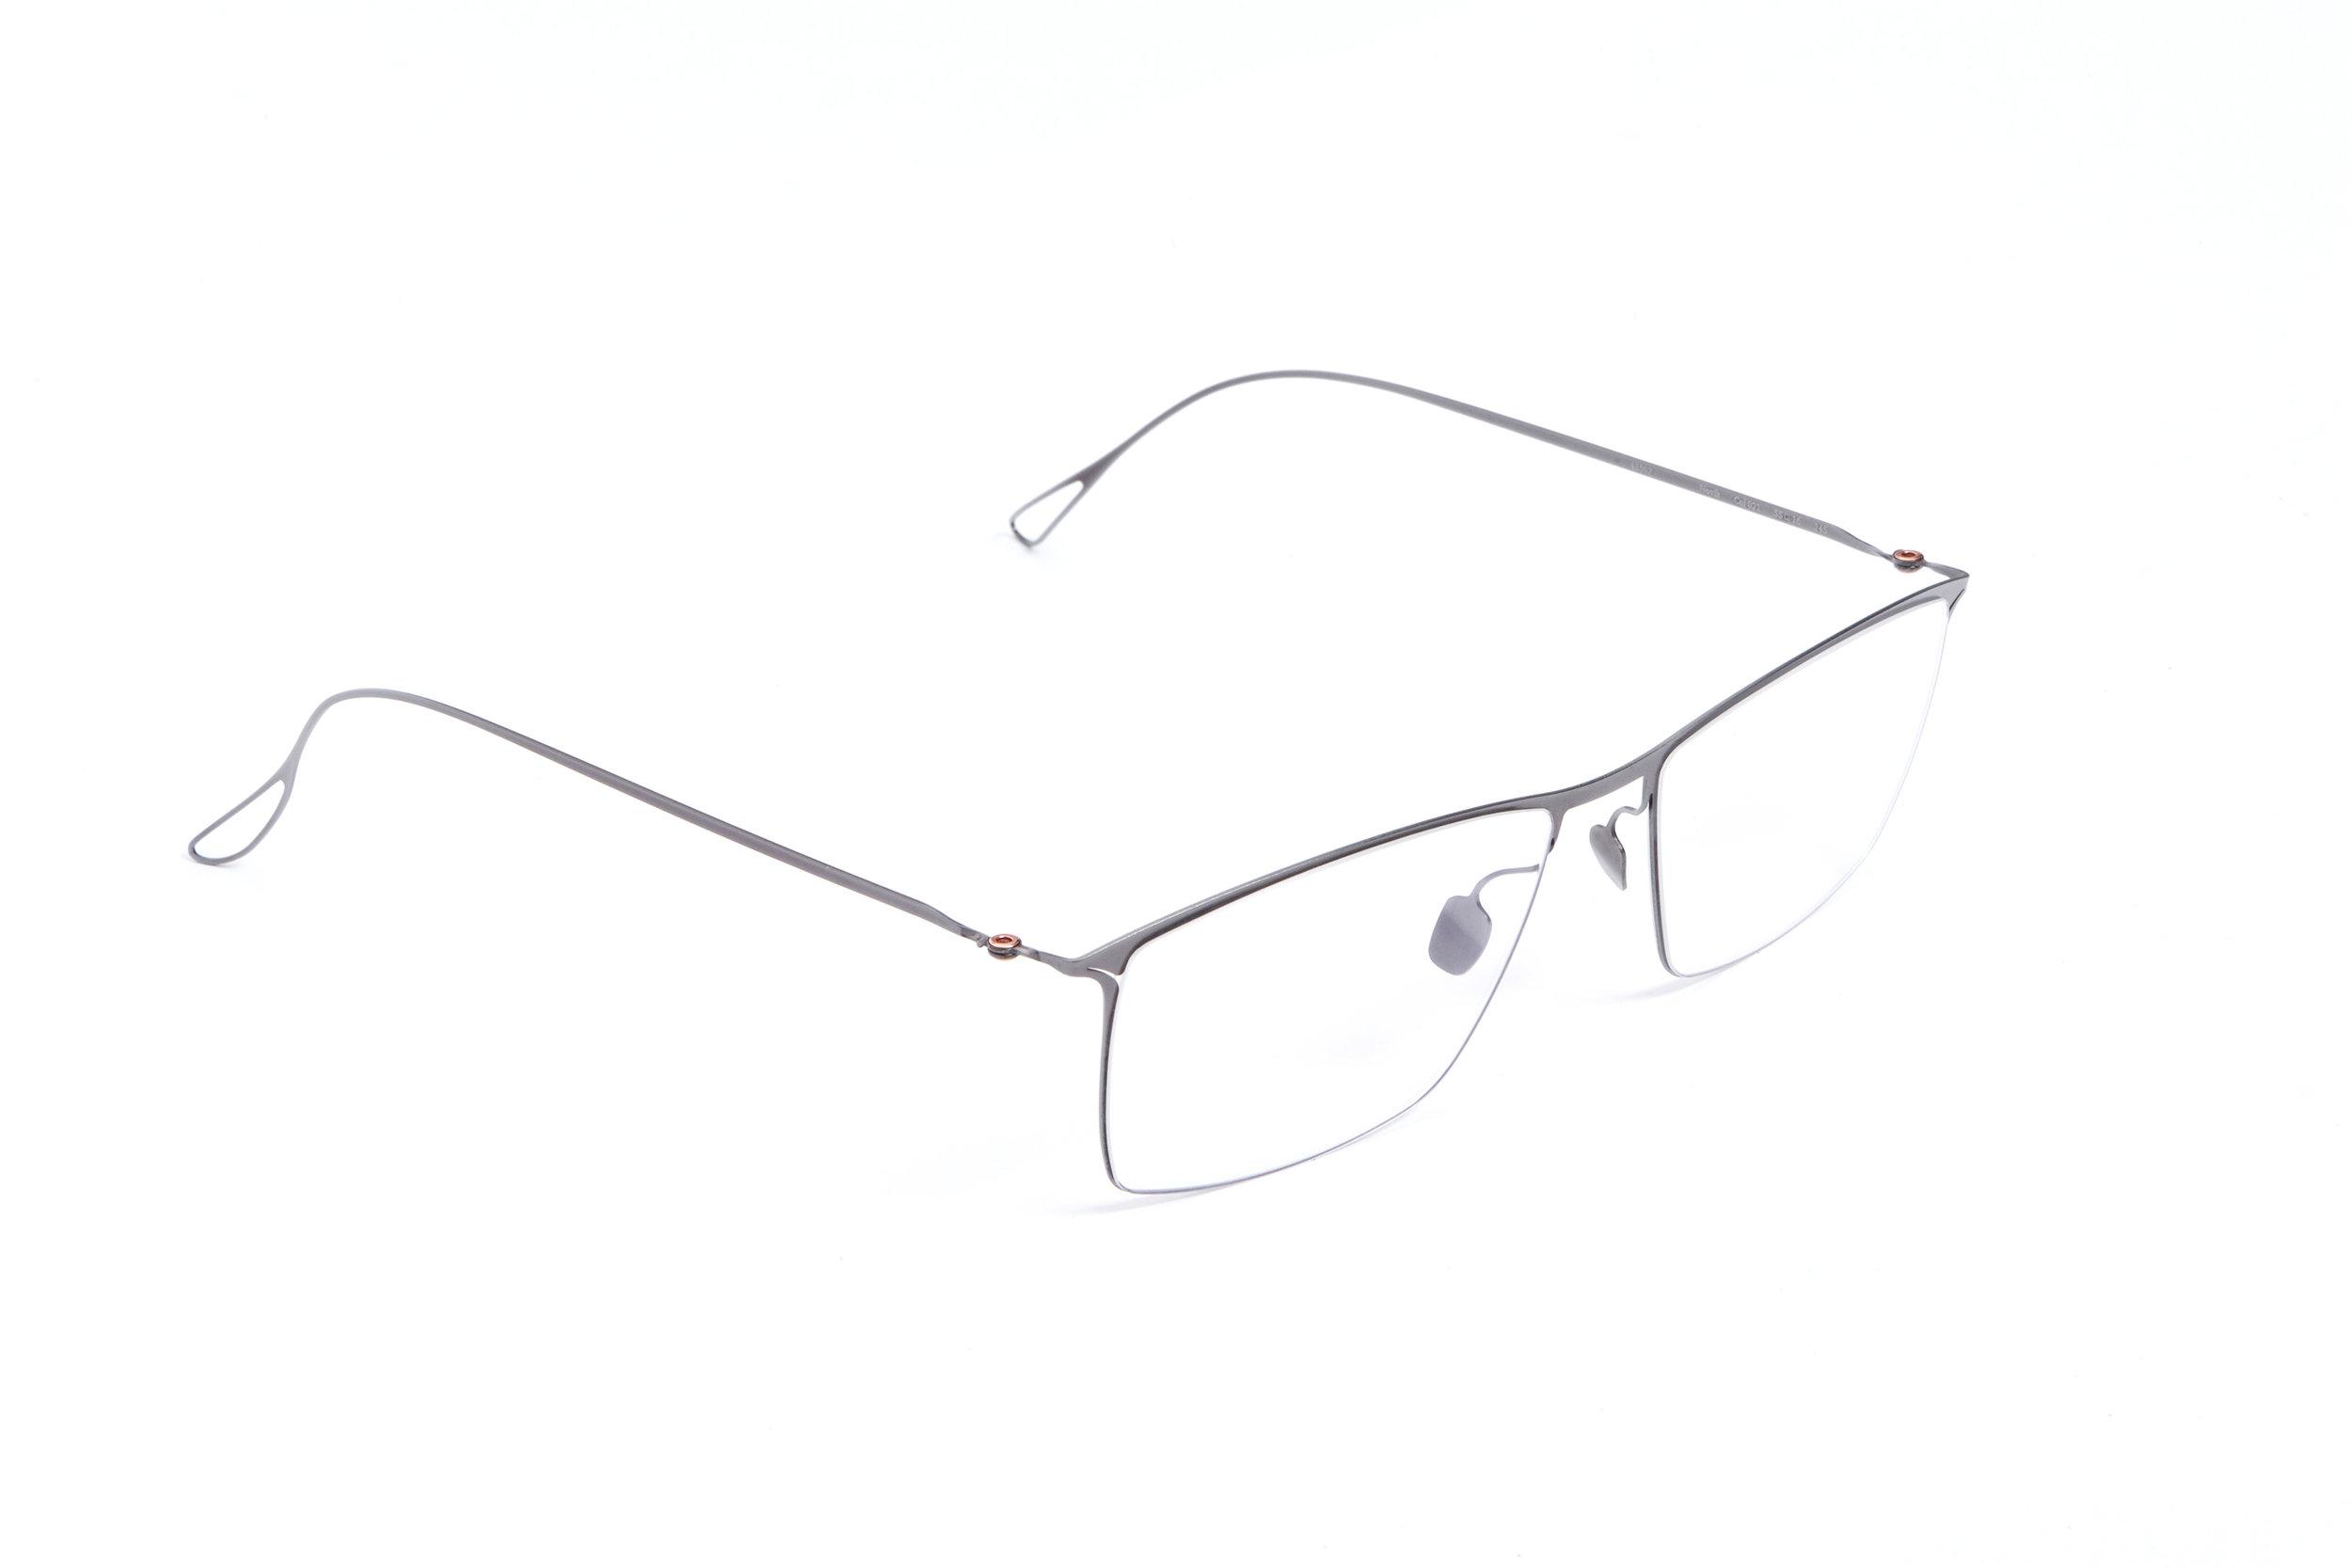 haffmans_neumeister_novik_gunmetal_clear_ultralight_eyeglasses_angle_102447.jpg